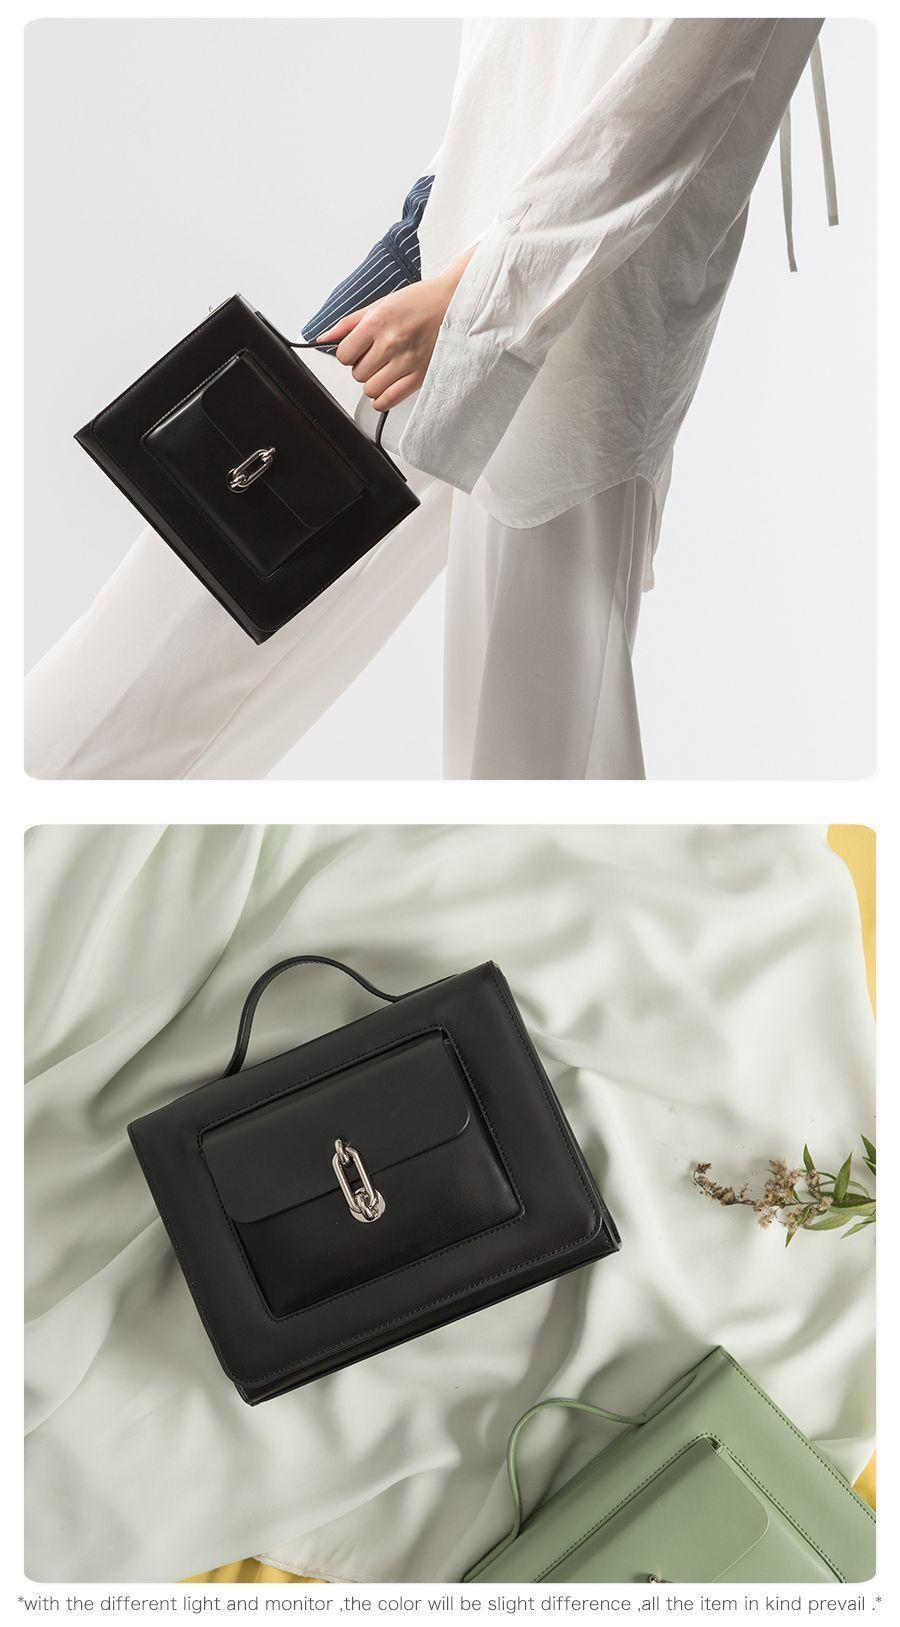 Viewinbox Luxury Handbags Women Bags Designer Small Flat Leather Postman Bag  Solid Cross body Messenger Bag Beautician Lady Bags  luxuryhandbags   ... 4969cc7a162df